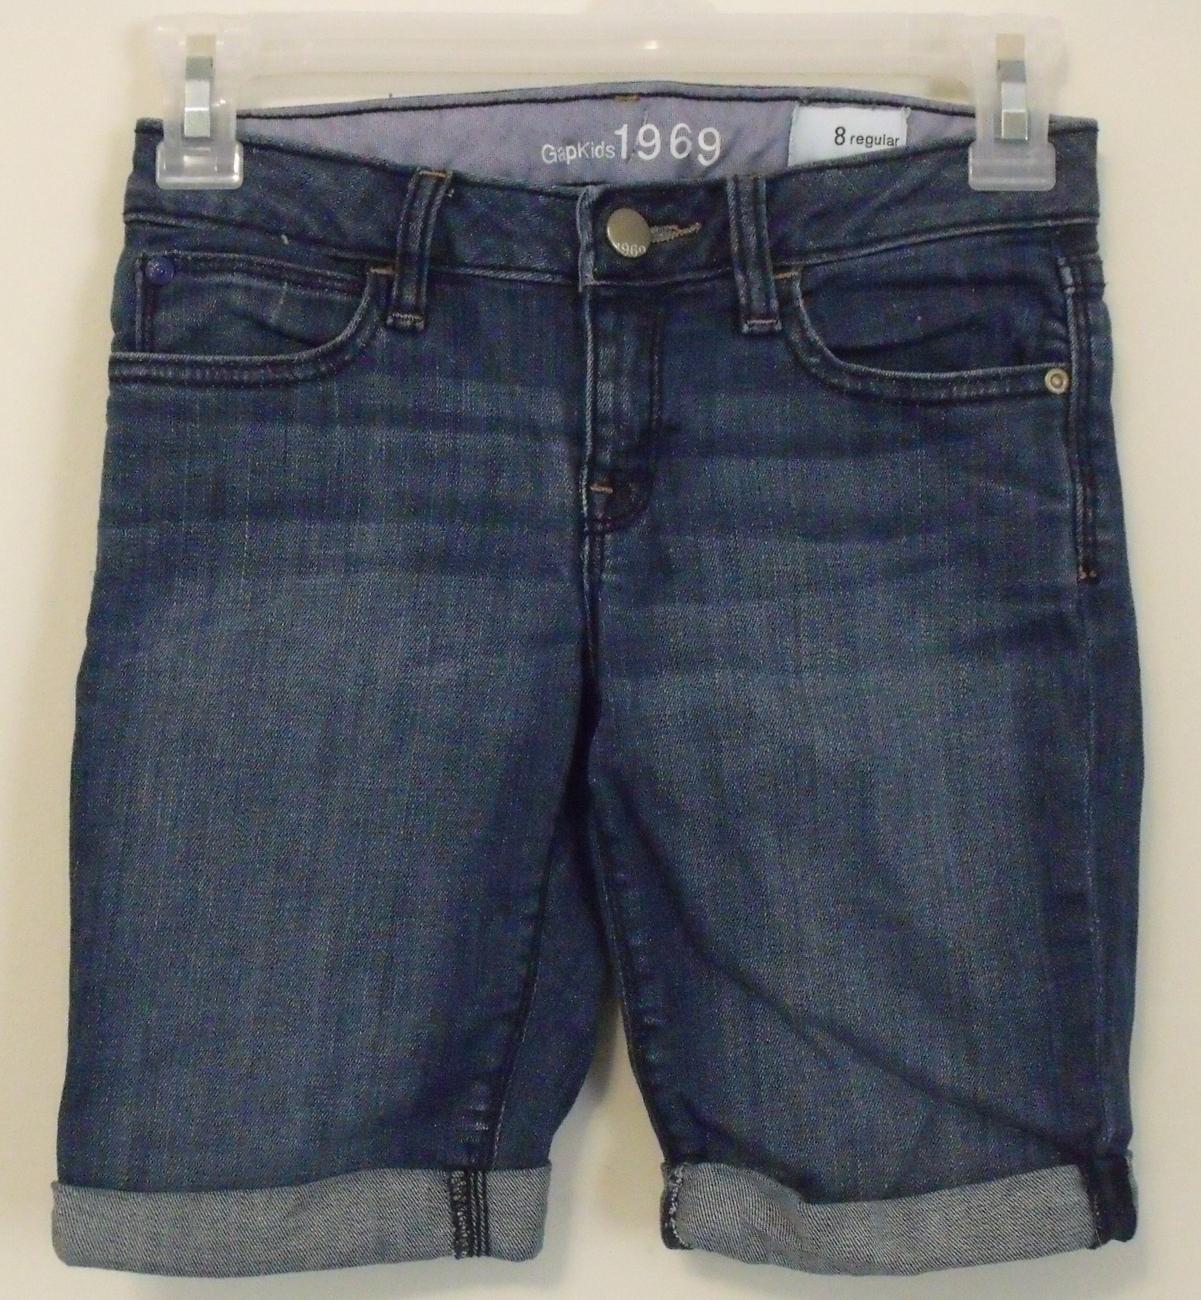 Girls gapkids jean shorts size 8